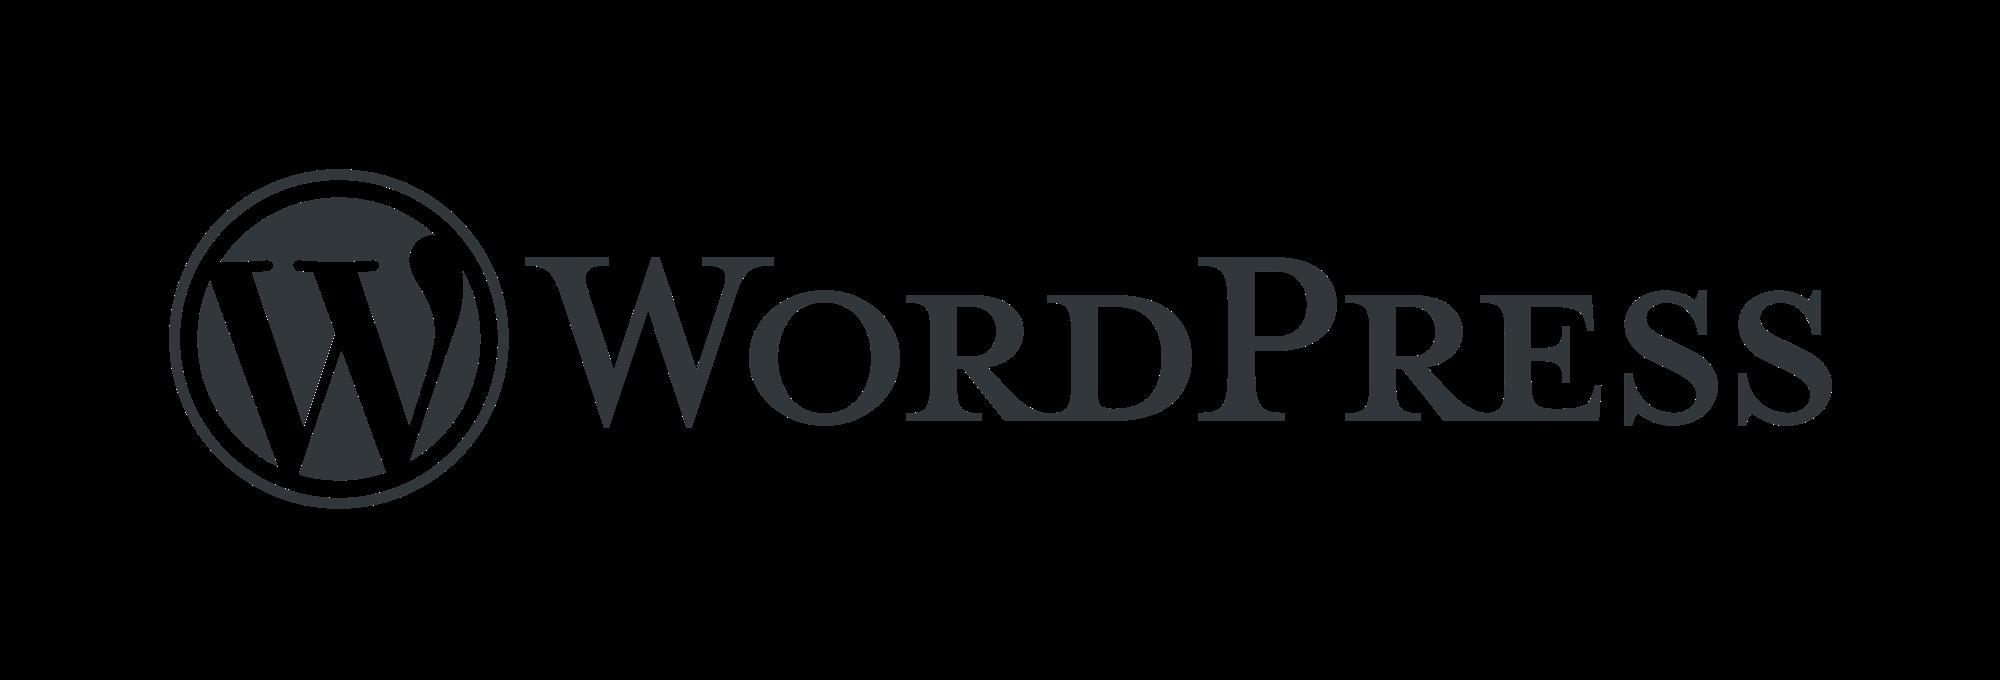 WordPress|プラグイン